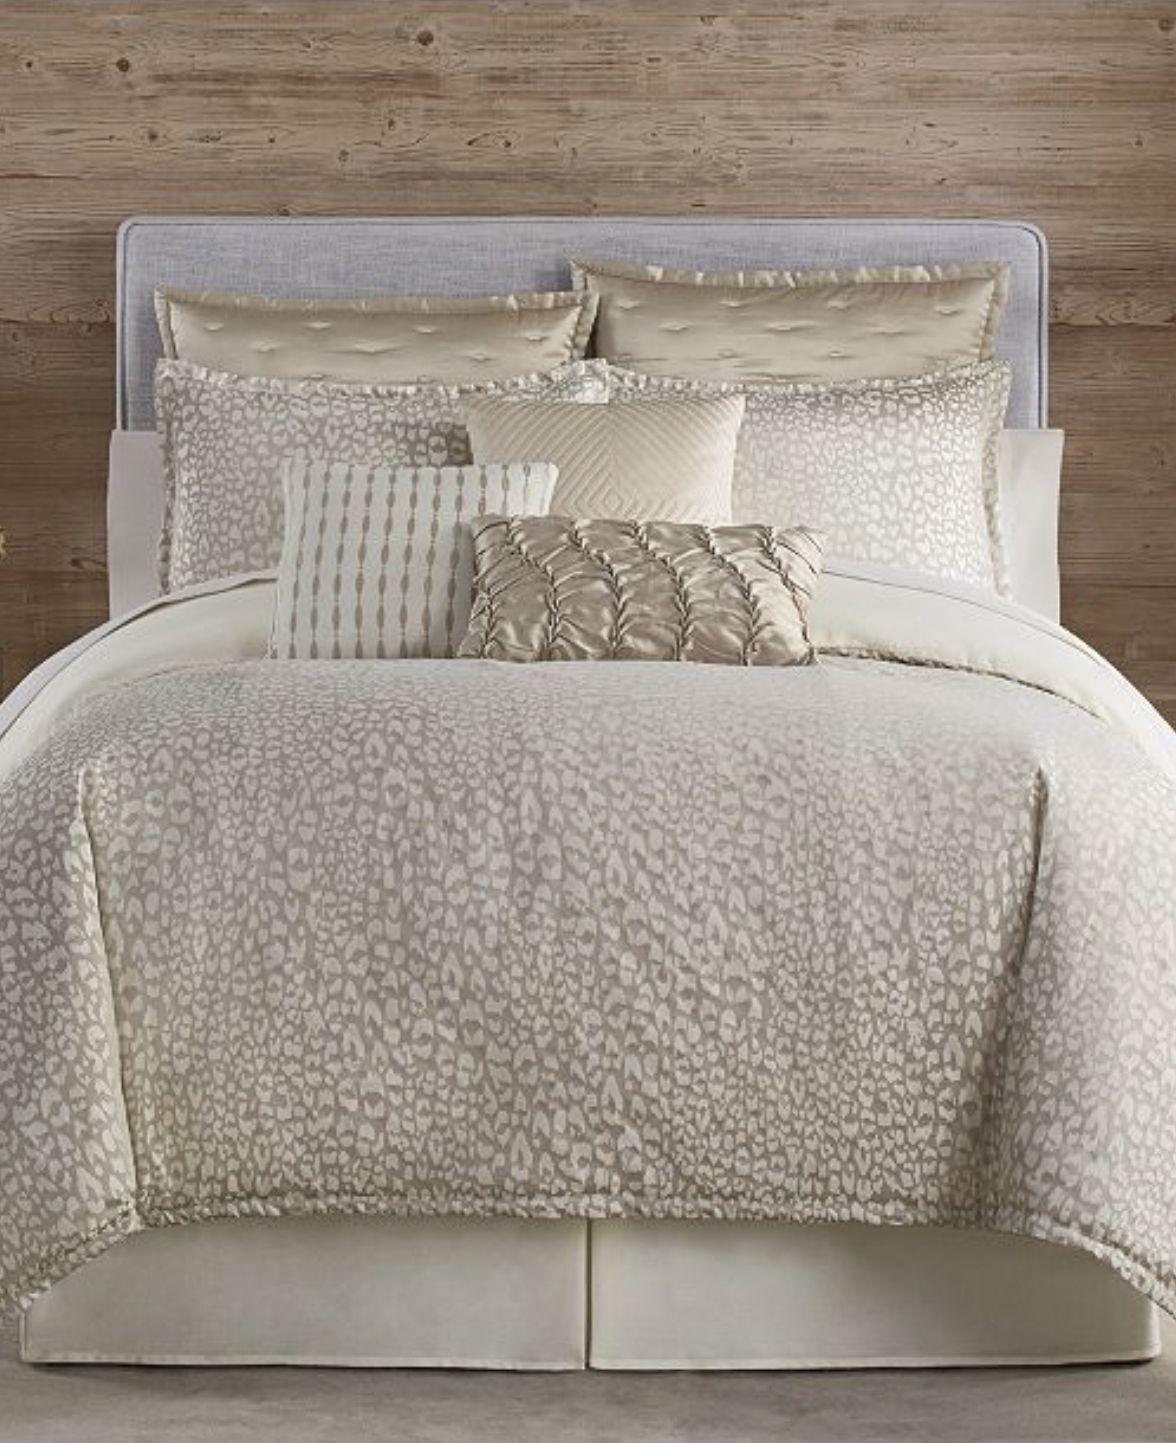 Eva Longoria Black Label Leopard Collection King Comforter Set Reviews Comforters Fashion Bed Bath Macy S Bedroom Comforter Sets Comforter Sets Leopard Bedding